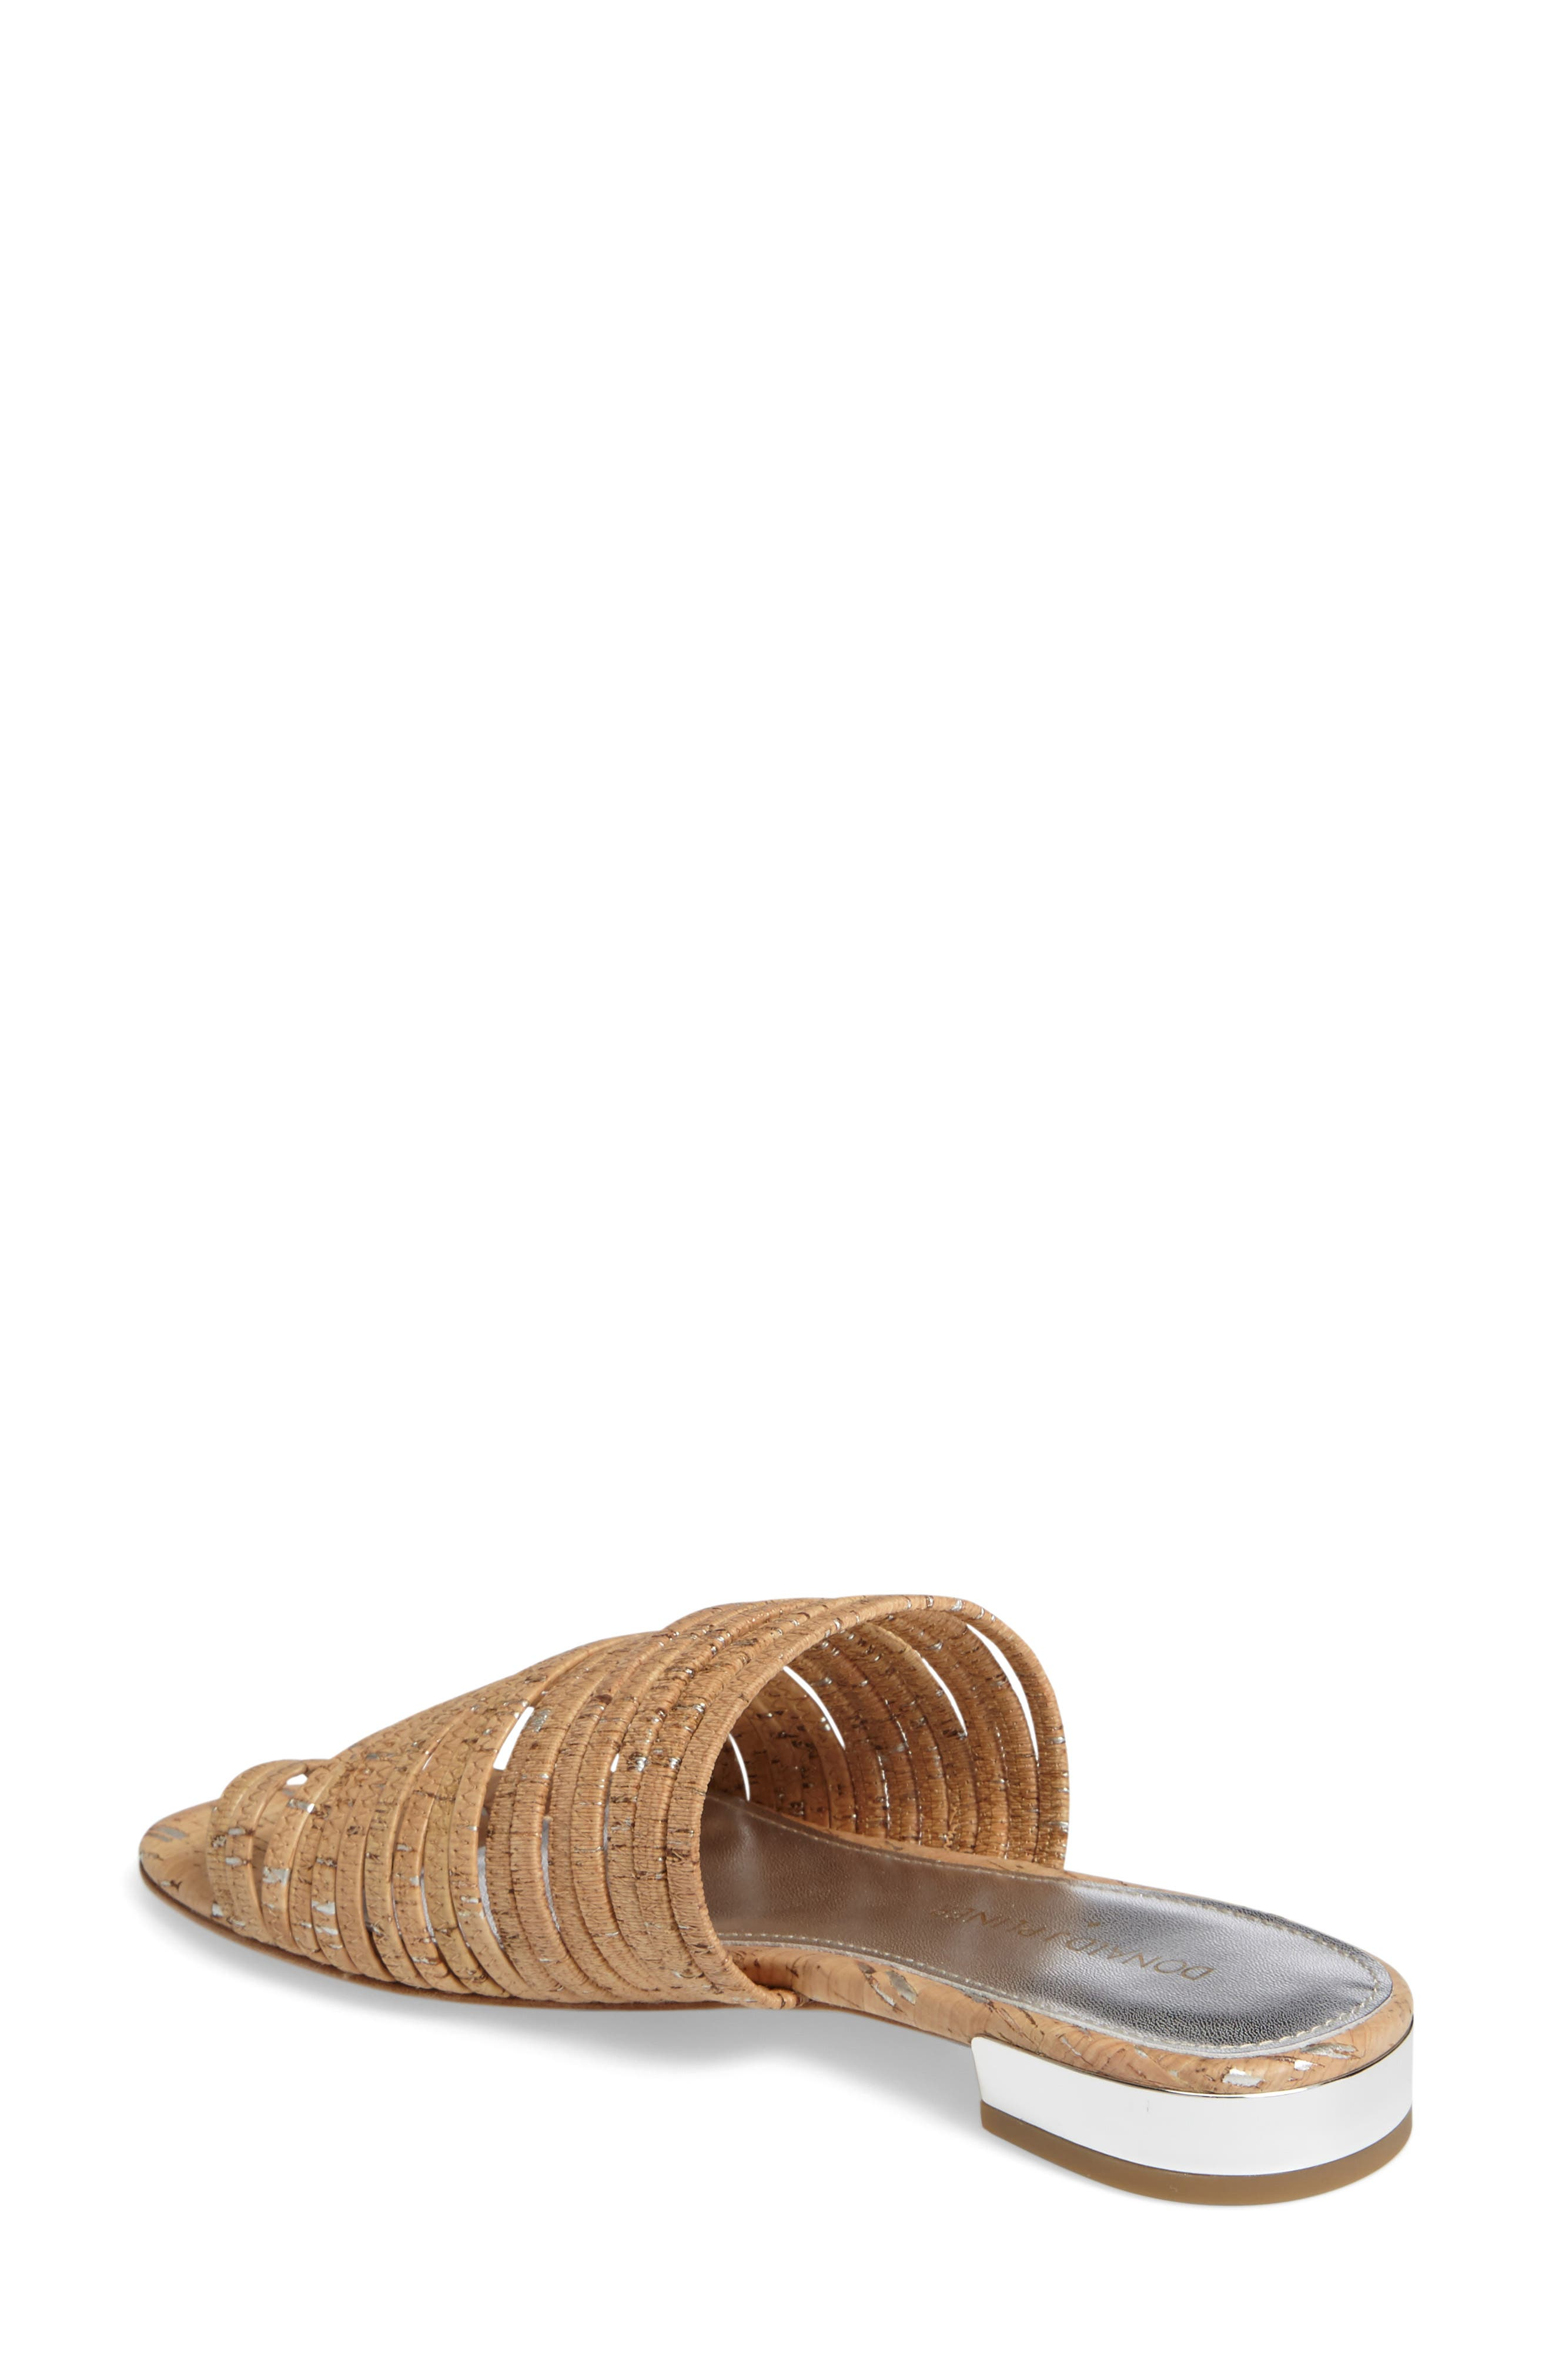 Frea Strappy Sandal,                             Alternate thumbnail 2, color,                             Natural Cork